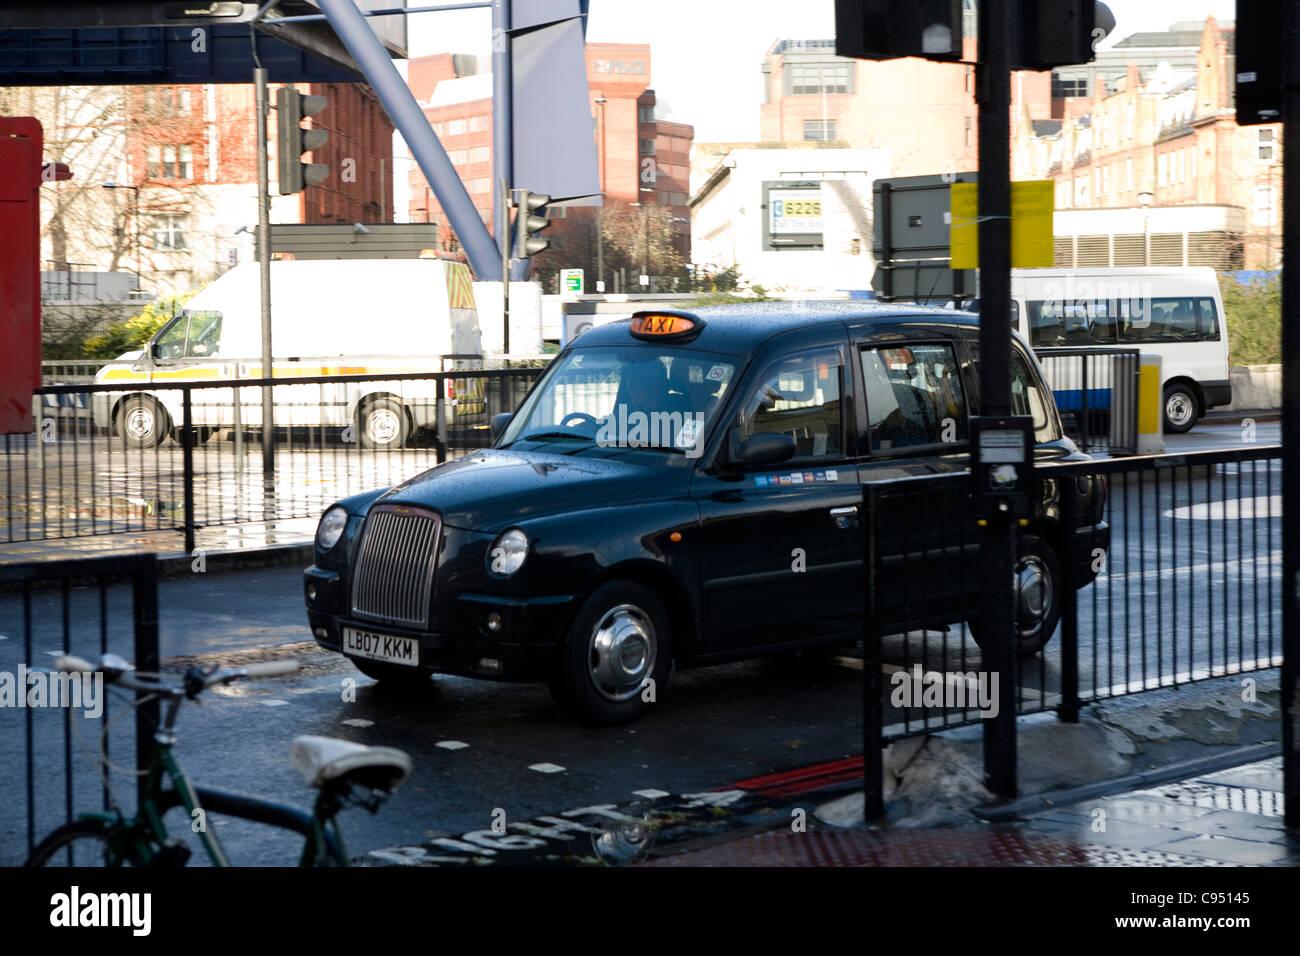 Black cab driving through London street. - Stock Image